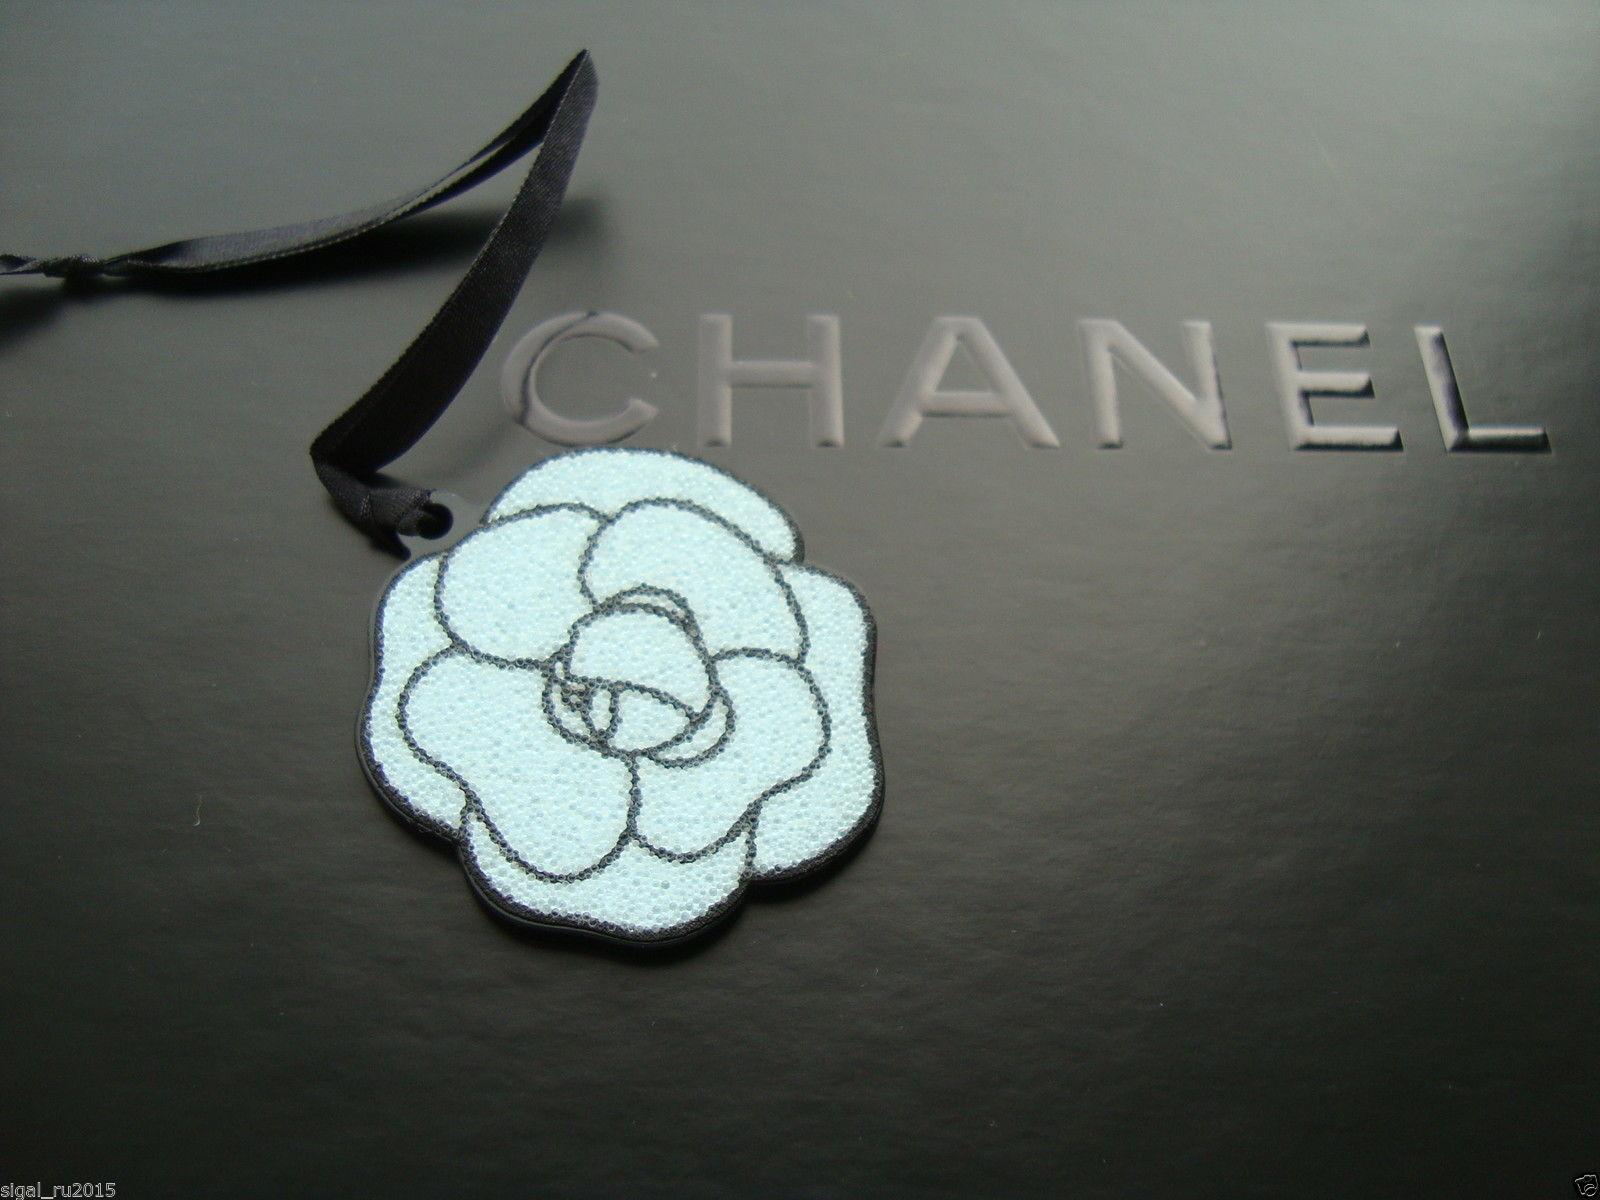 b4e9b750b067 CHANEL Pendant Charm Blue Flower Camellia Small Authentic VIP Gift ...